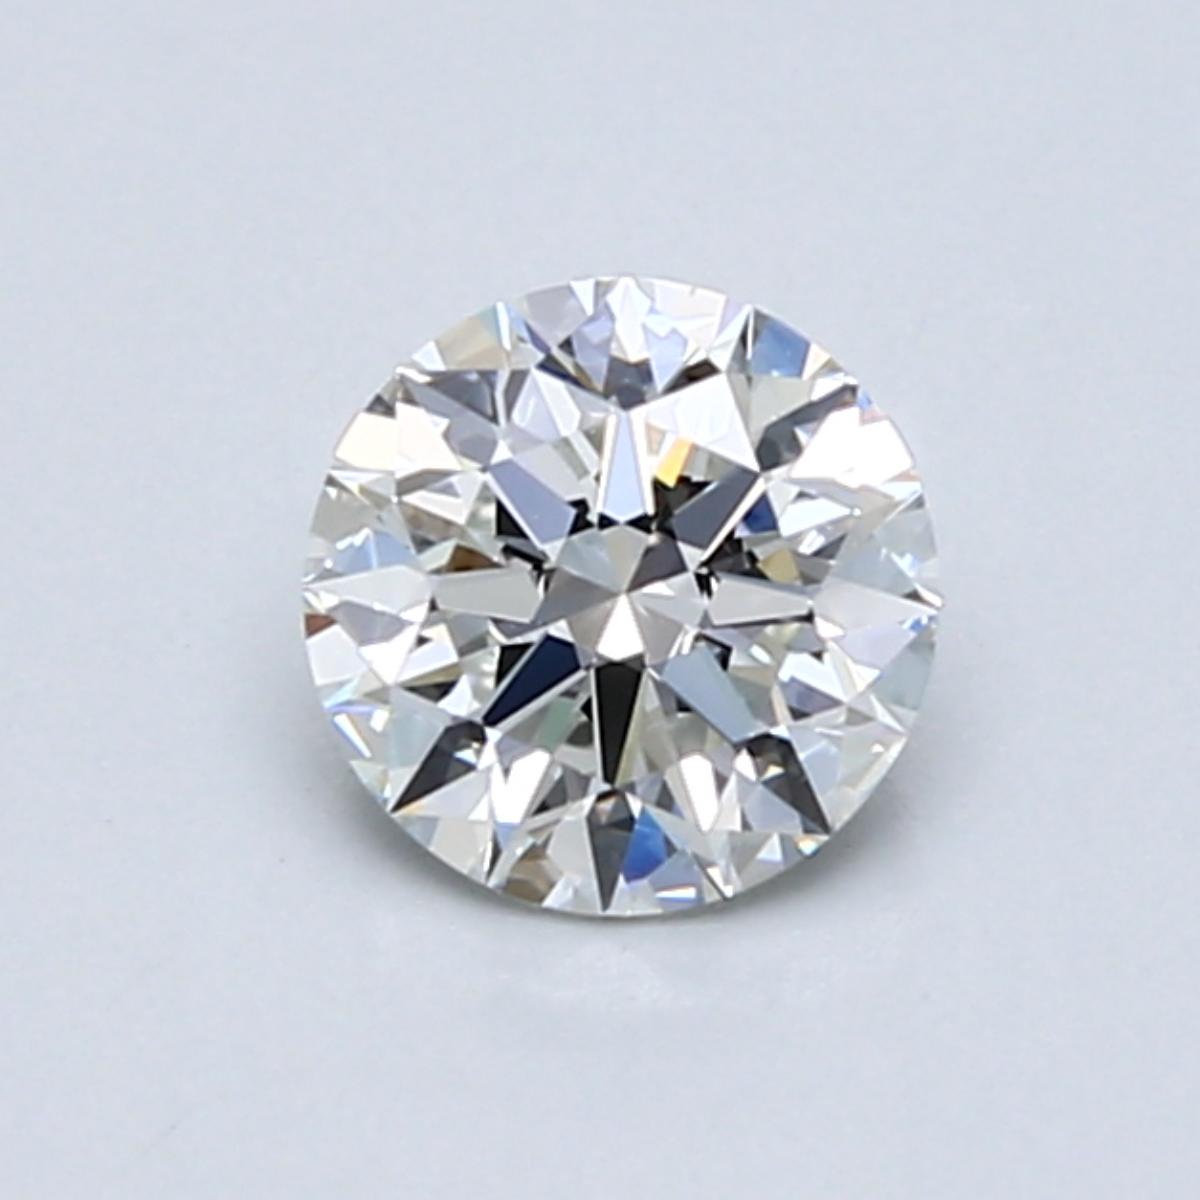 0.75 RD Diamond (G, VS2)